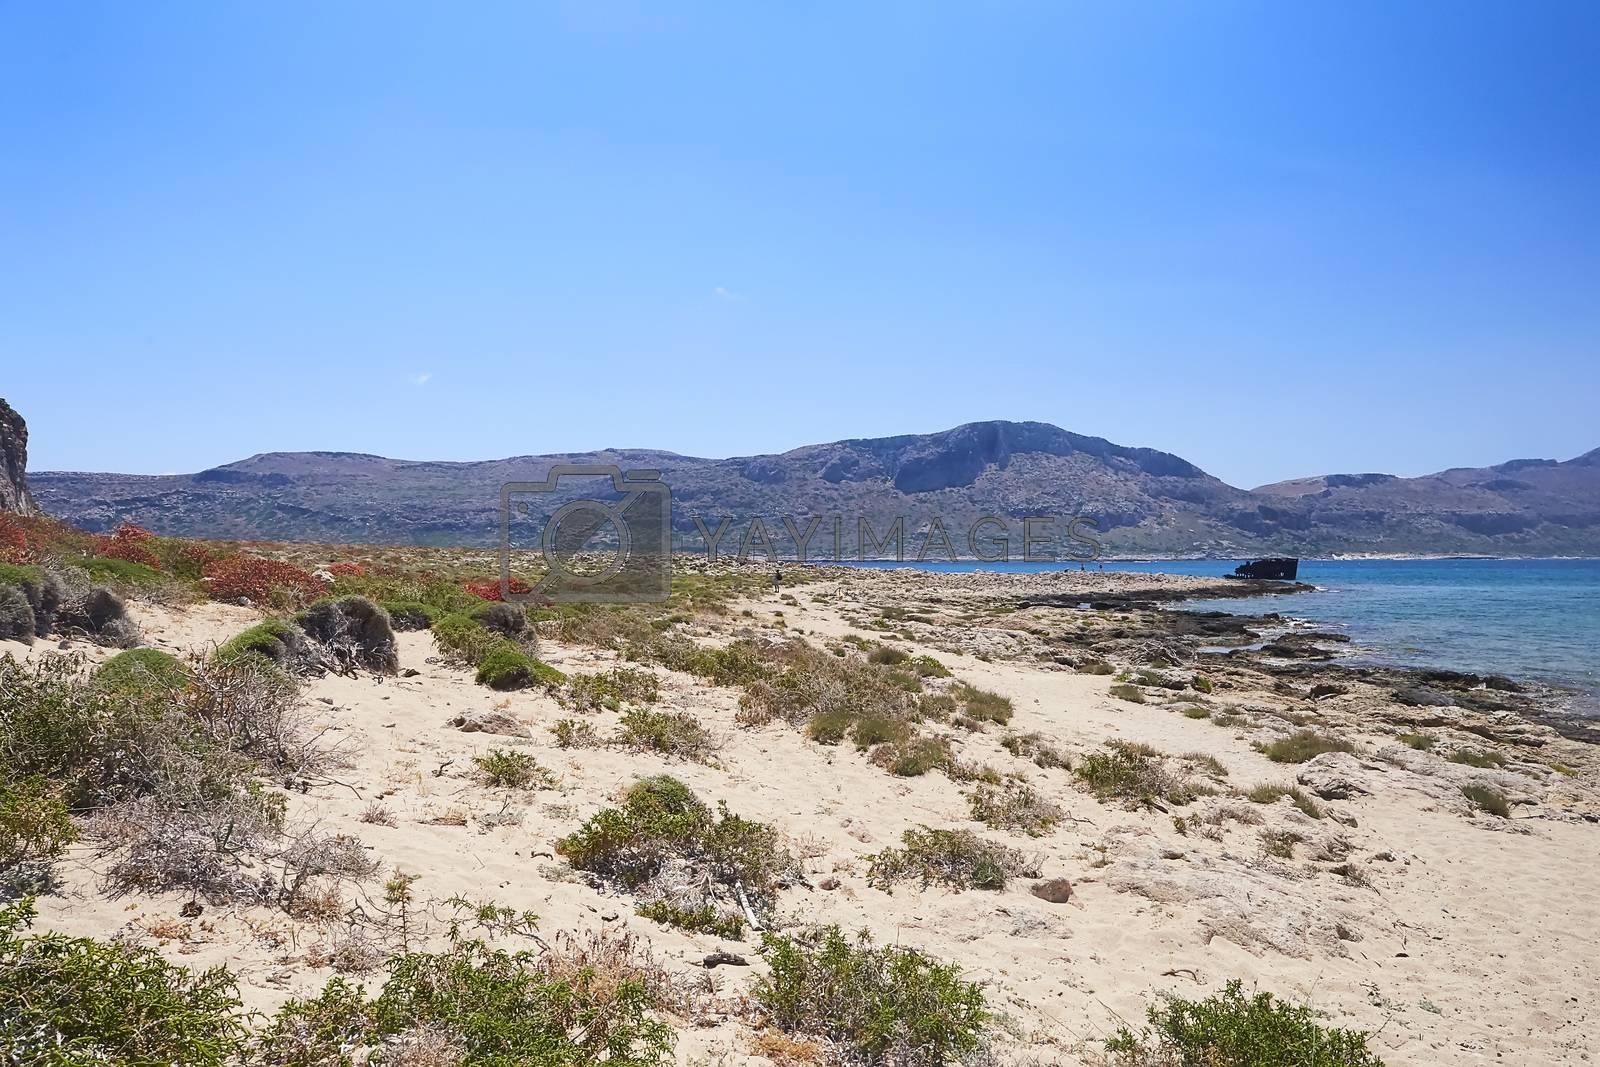 GRAMVOUSA - BALOS, THE CRETE ISLAND, GREECE - JUNE 4, 2019: Beautiful seaview at the Balos island.